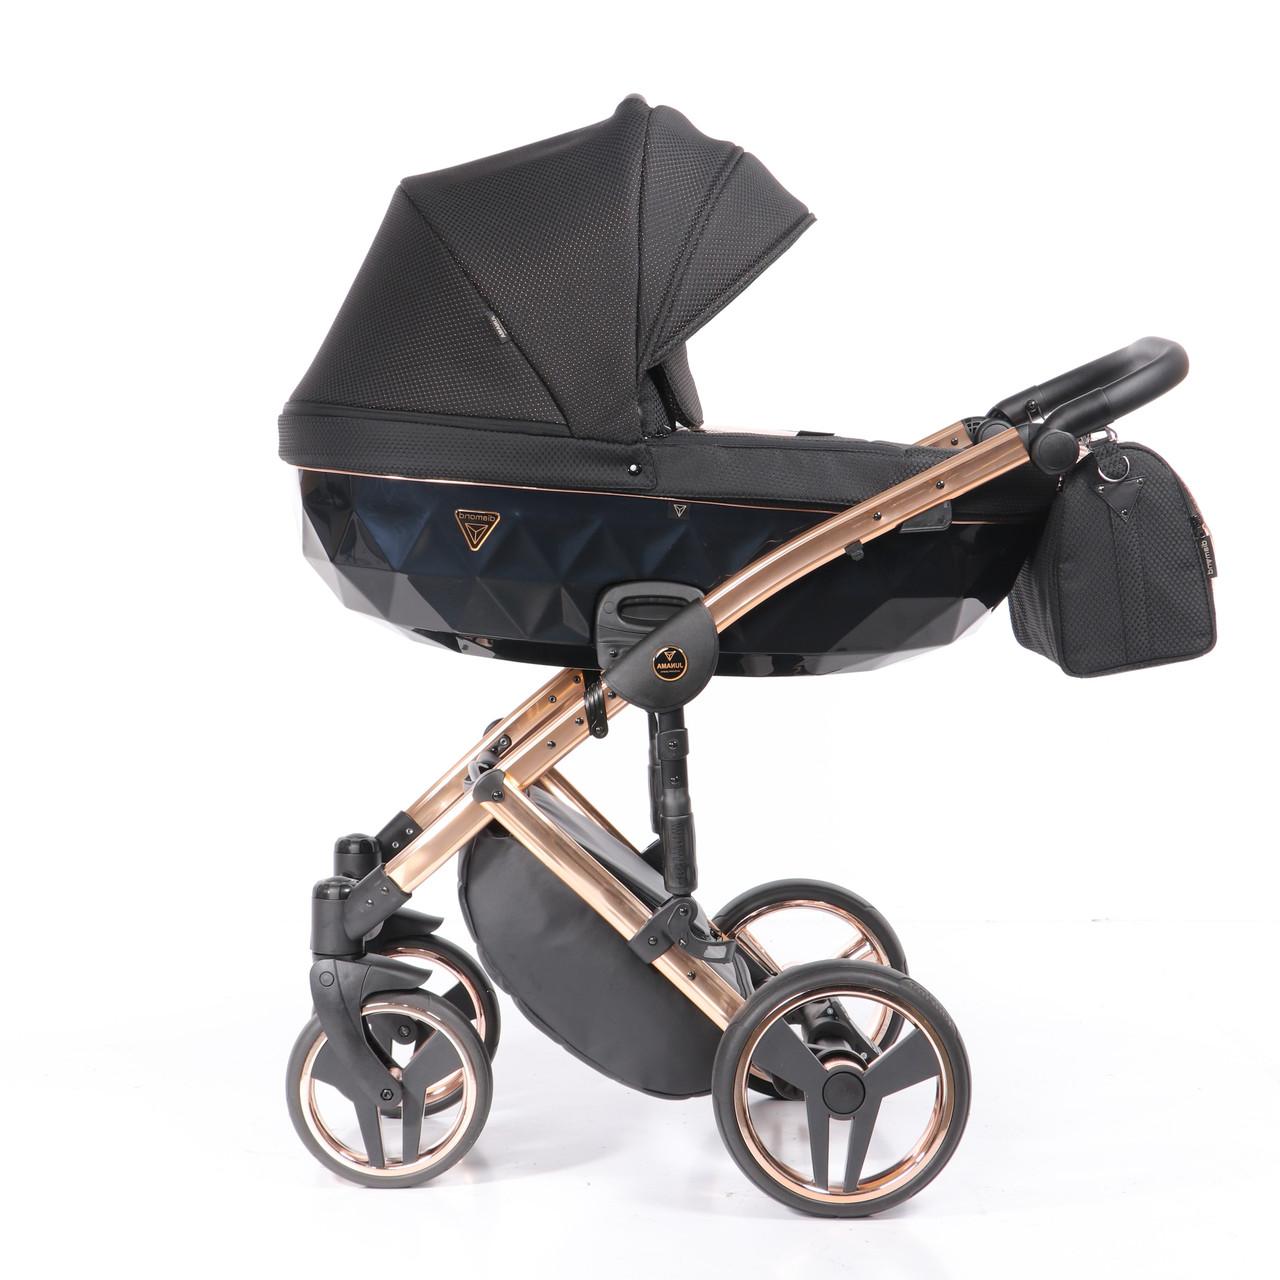 Дитяча універсальна коляска 2 в 1 Junama Onyx 02